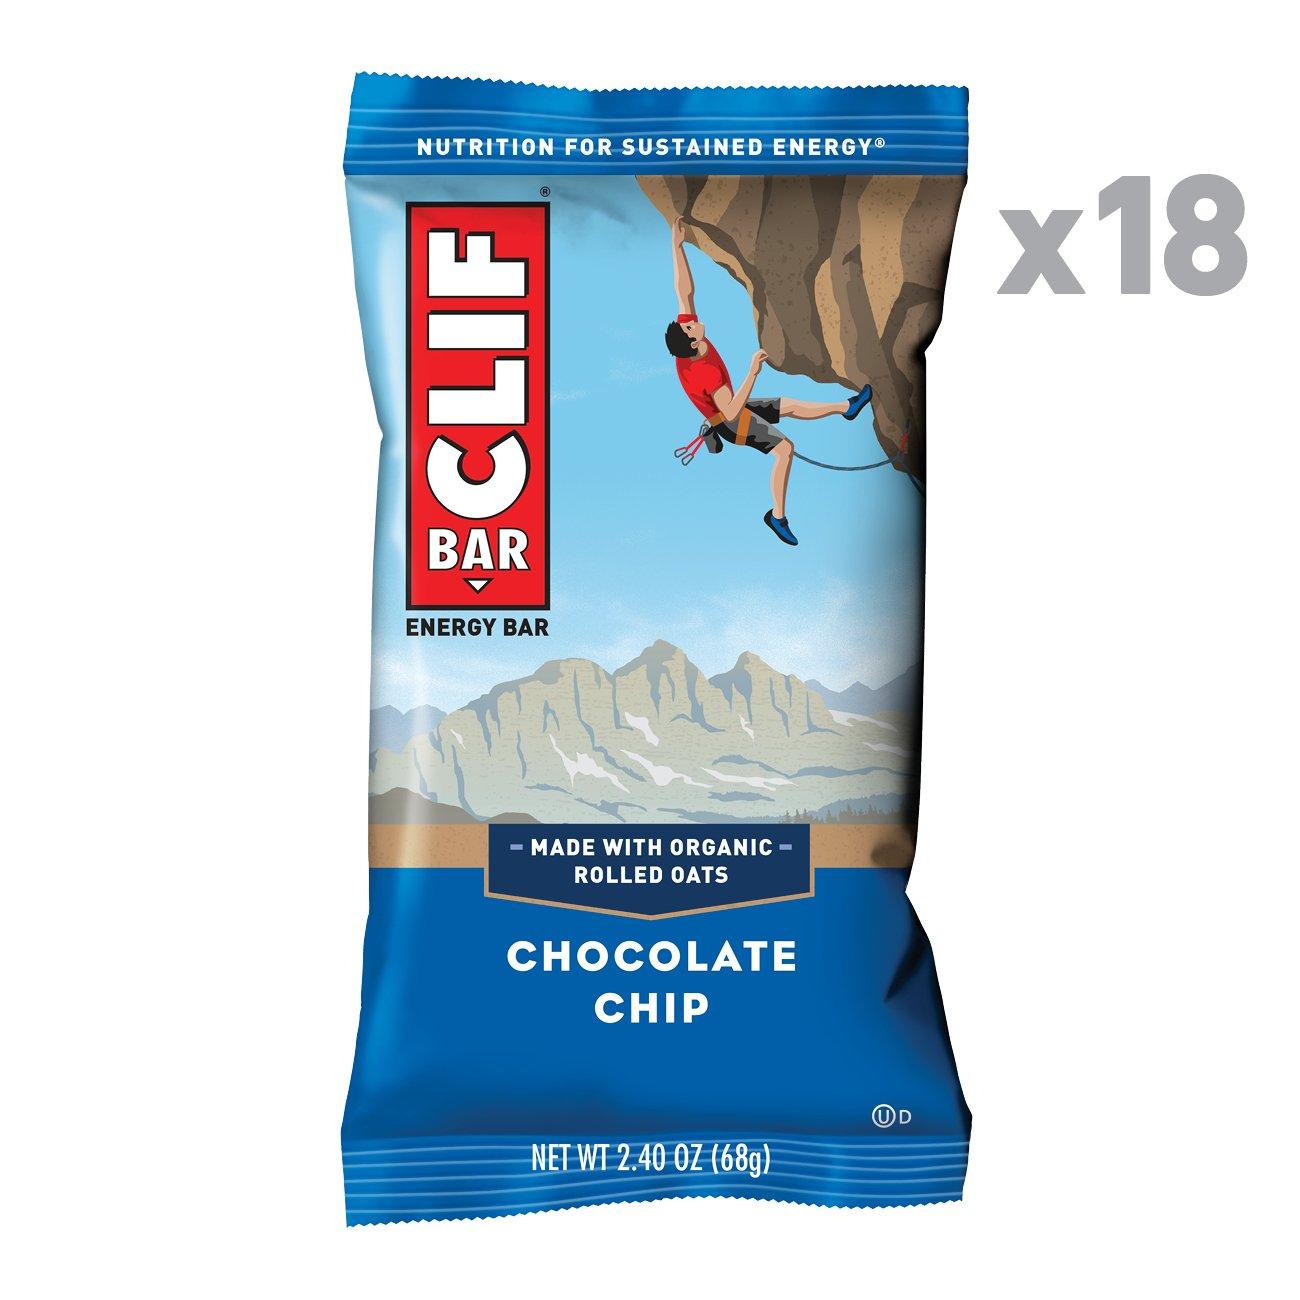 CLIF BAR - Energy Bars - Chocolate Chip - (2.4 Ounce Protein Bars, 18 Count) via Amazon $4.50